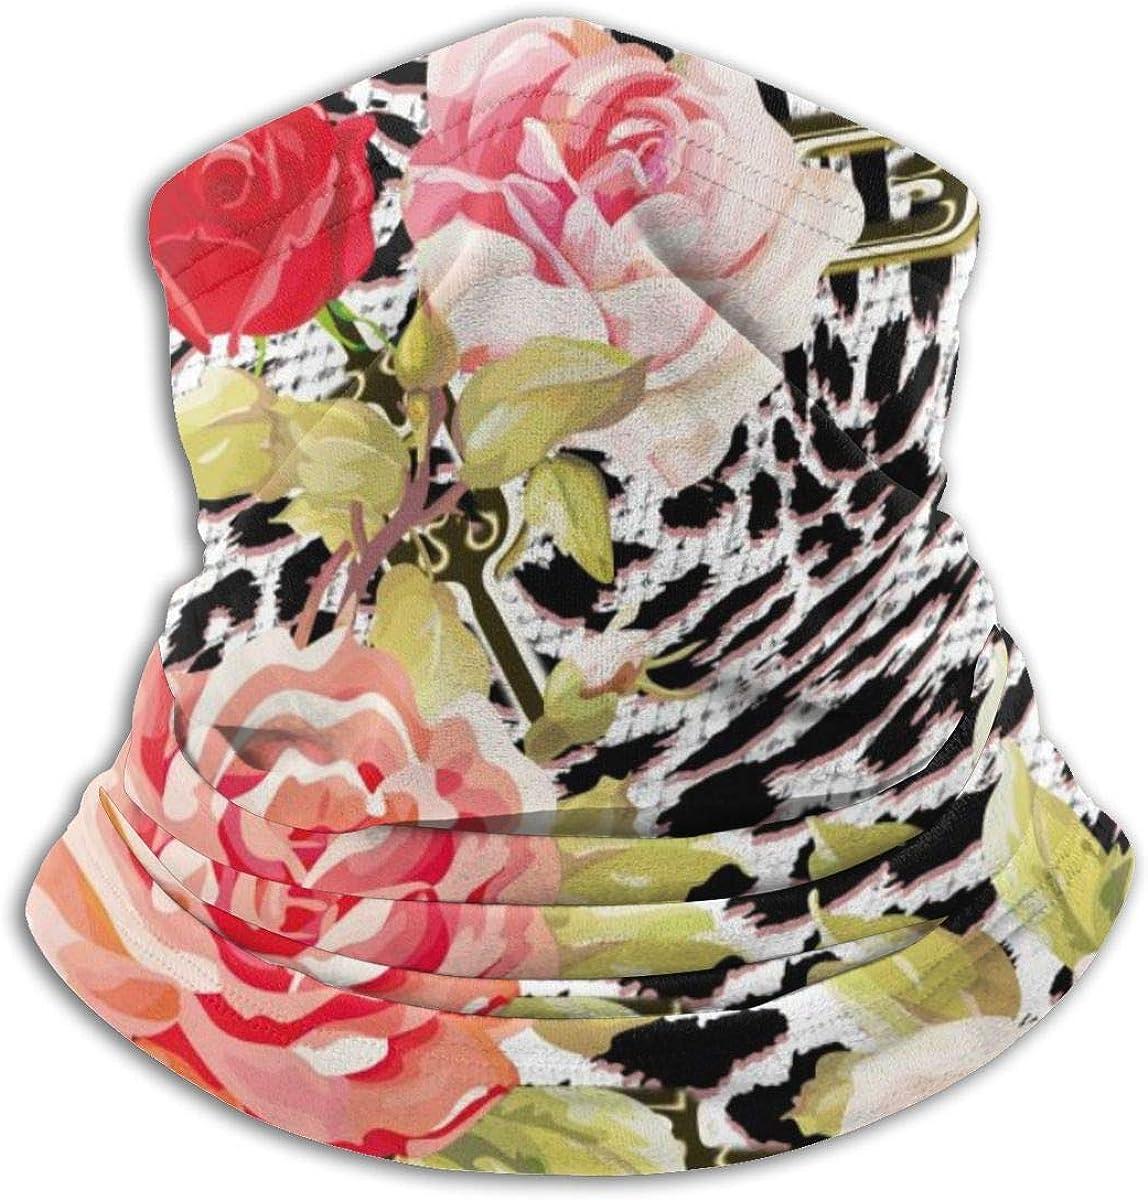 SLHFPX Neck Gaiter Face Mask Animal Leopard Print And Pink Rose Flowers Half Balaclava Ski Masks for Women Men Adult